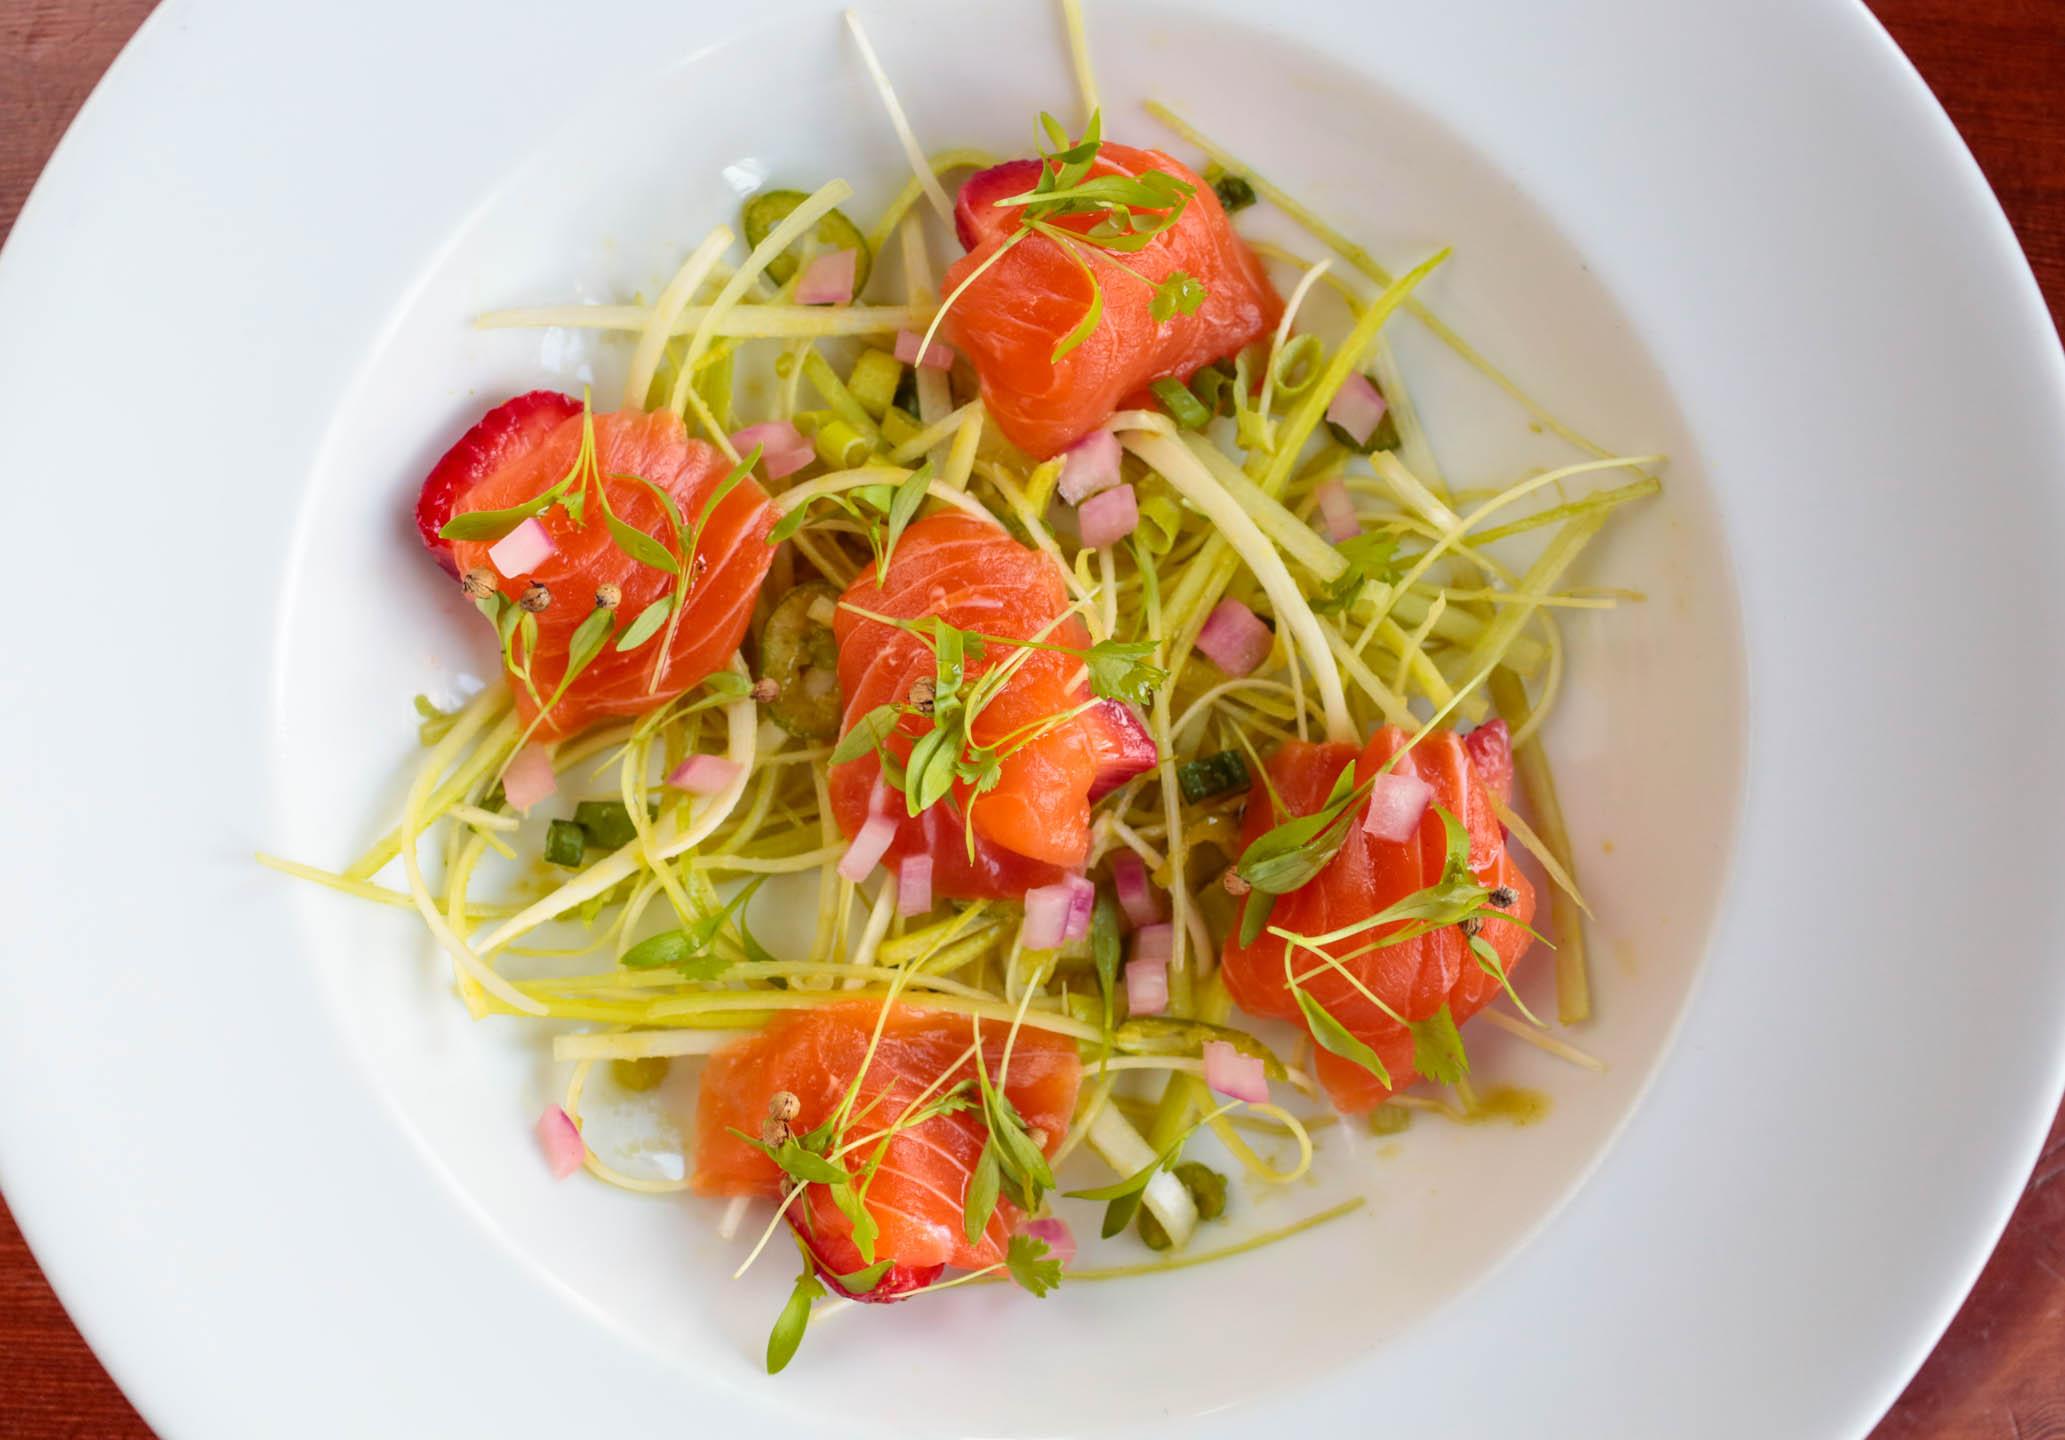 striffler-photography-lifestyle-food-Hamptons-5.jpg